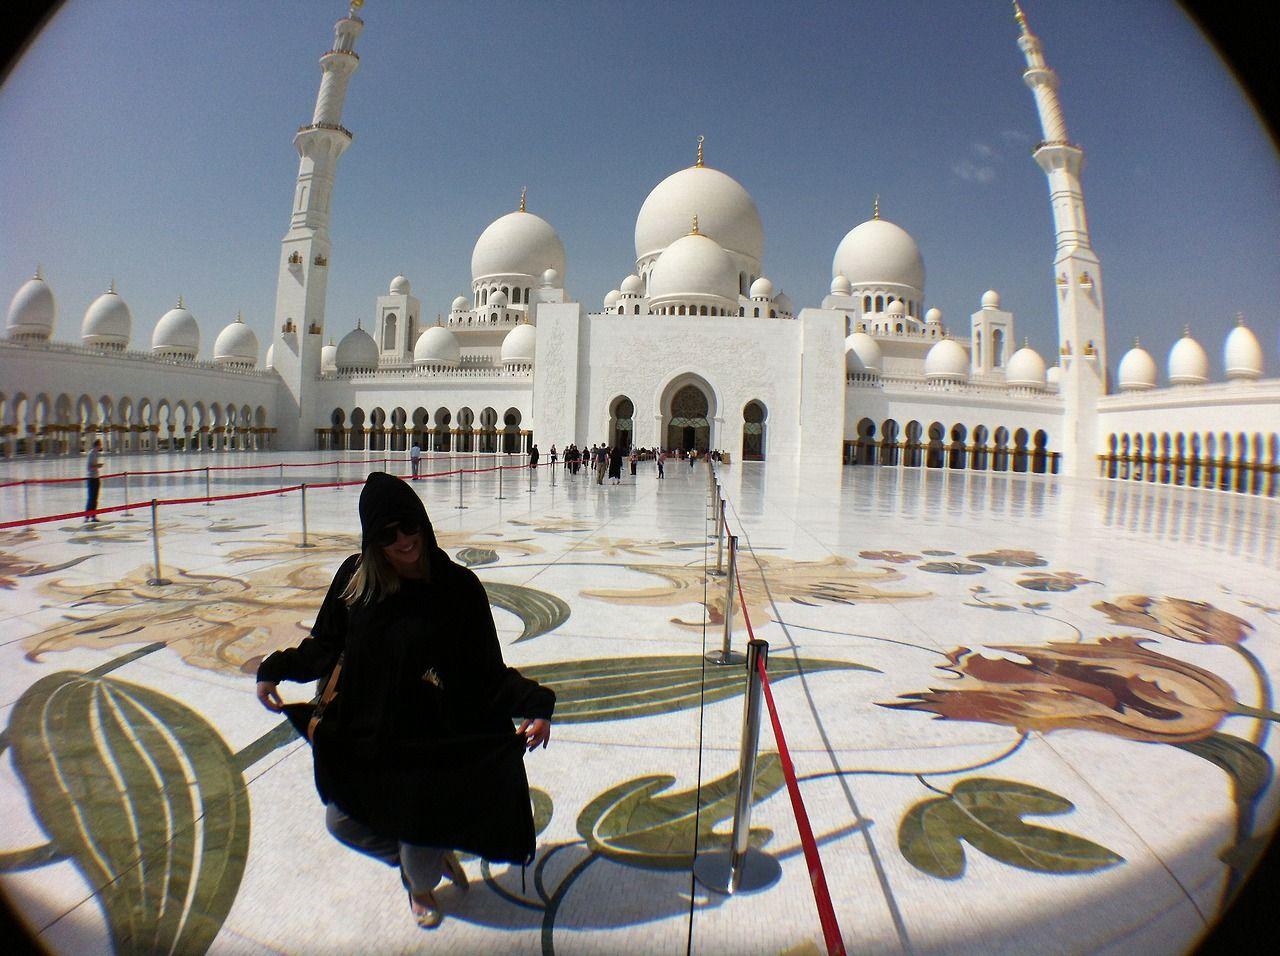 Sheikh Zayed Grand Mosque (and me), Abu Dhabi, UAE.